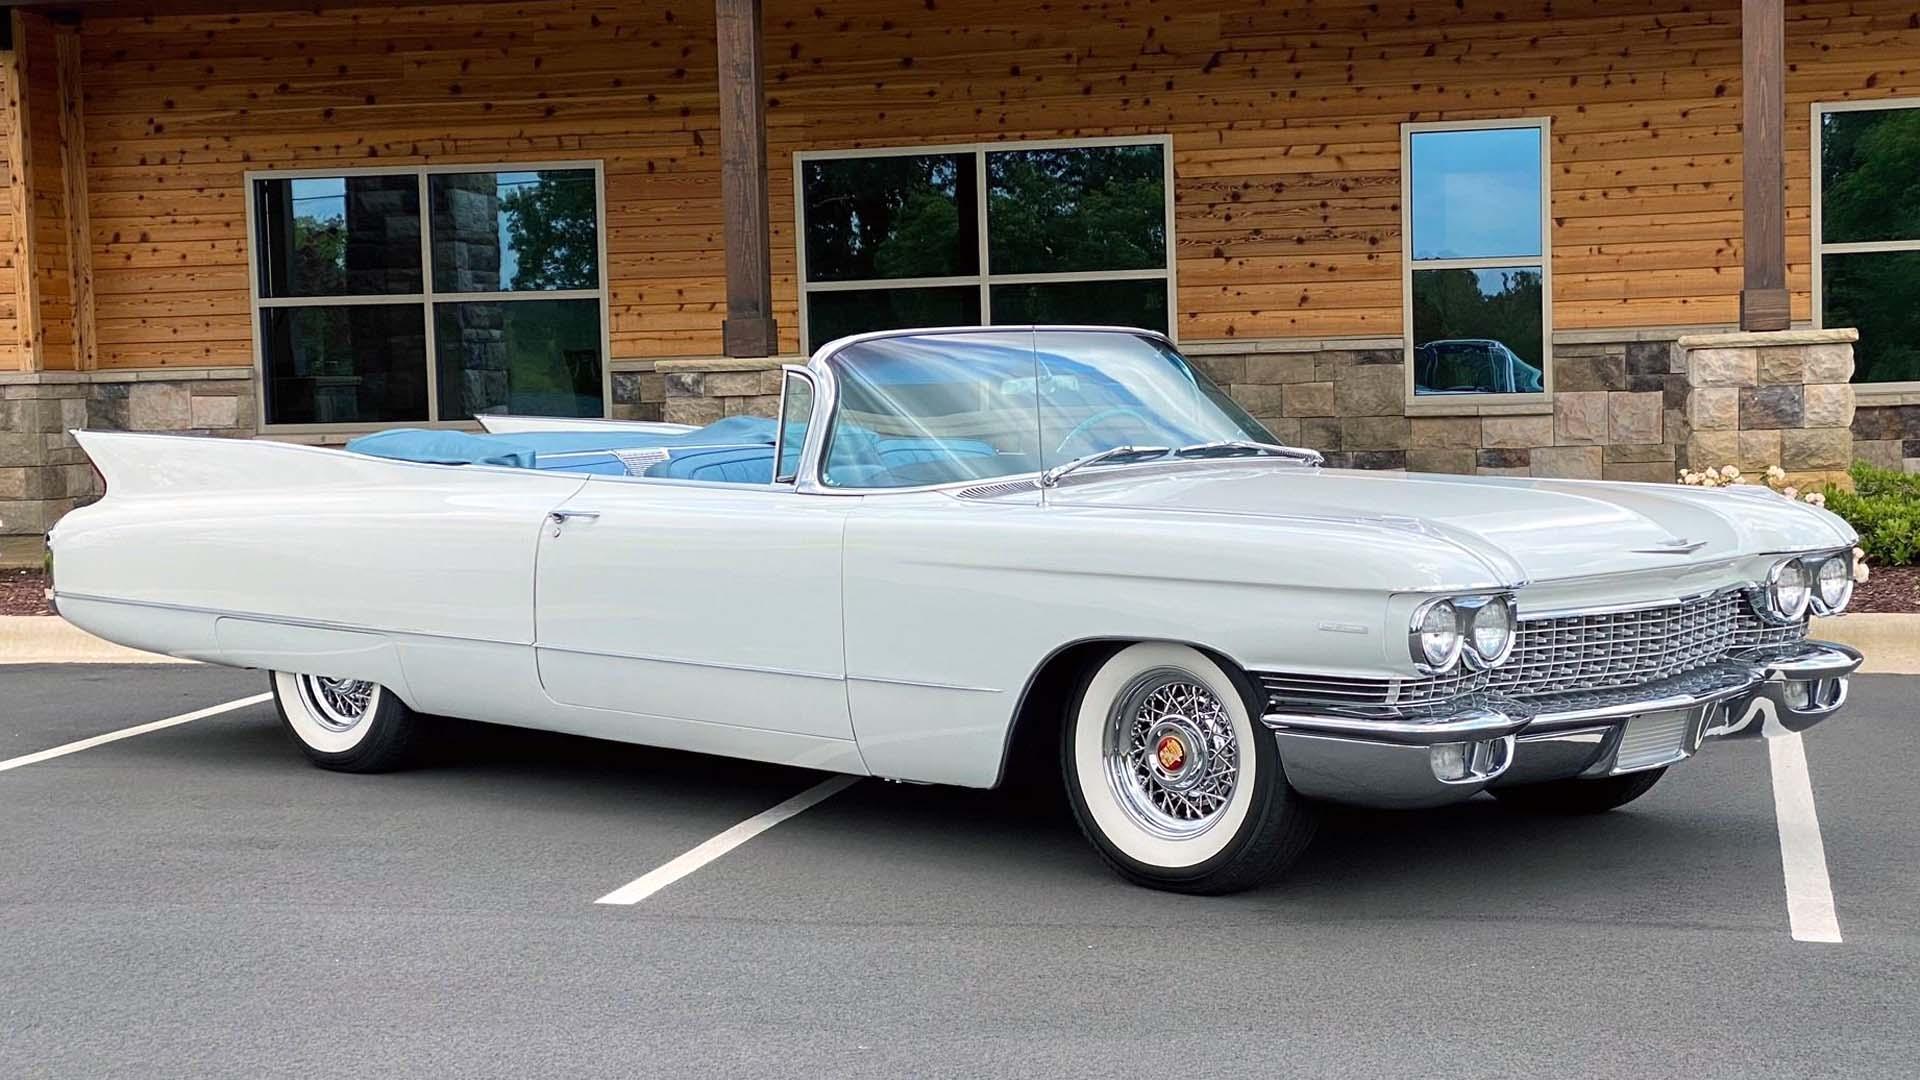 1960 Cadillac Series 62 Is A Fintastic Cruiser